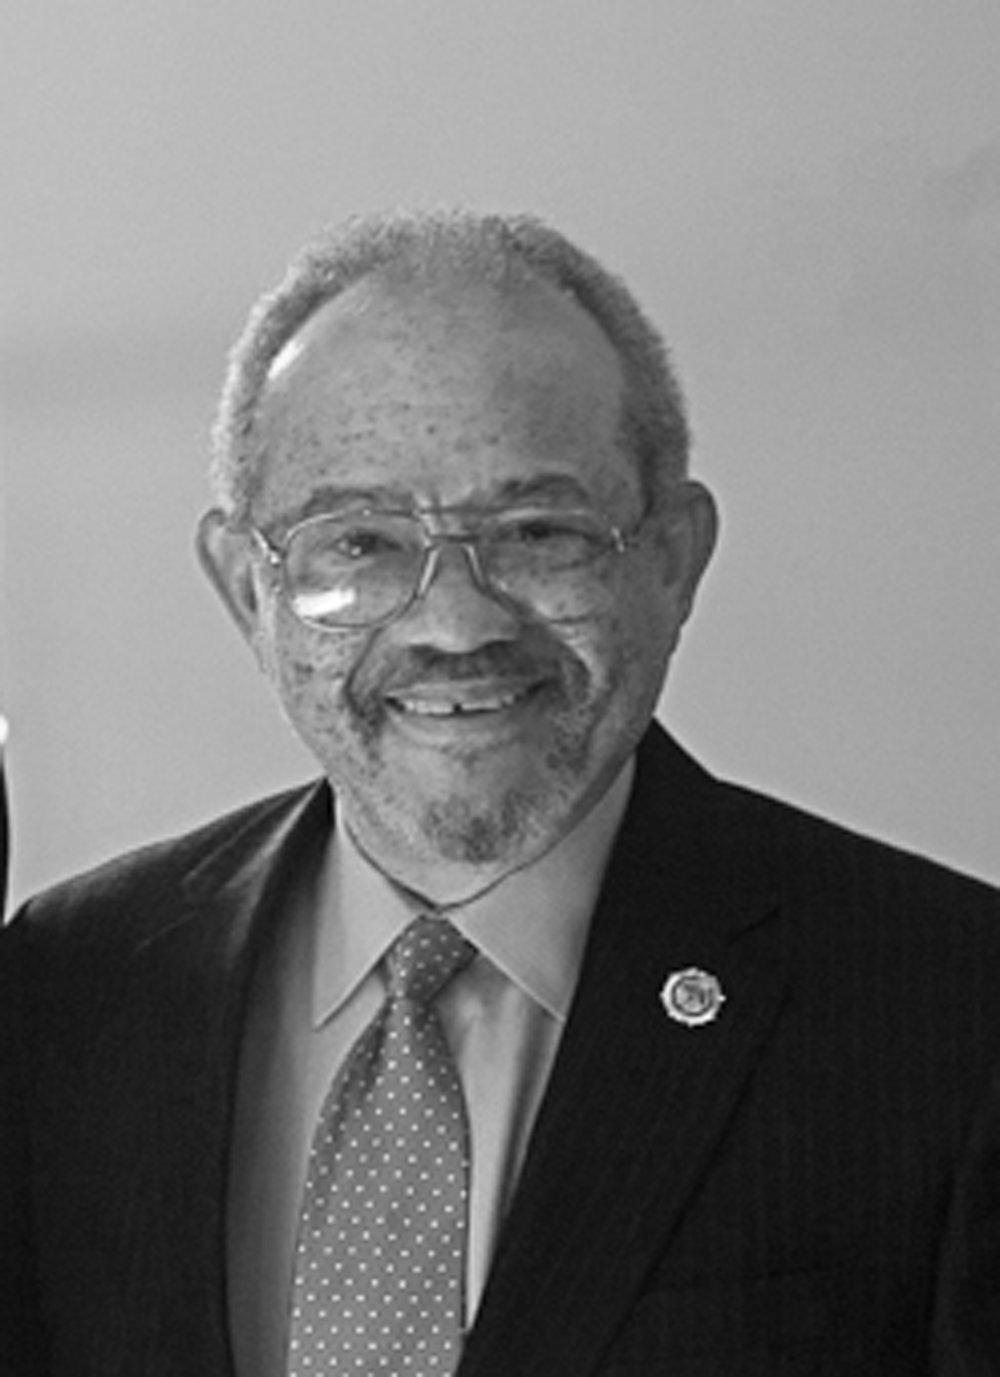 Charles C. Allen